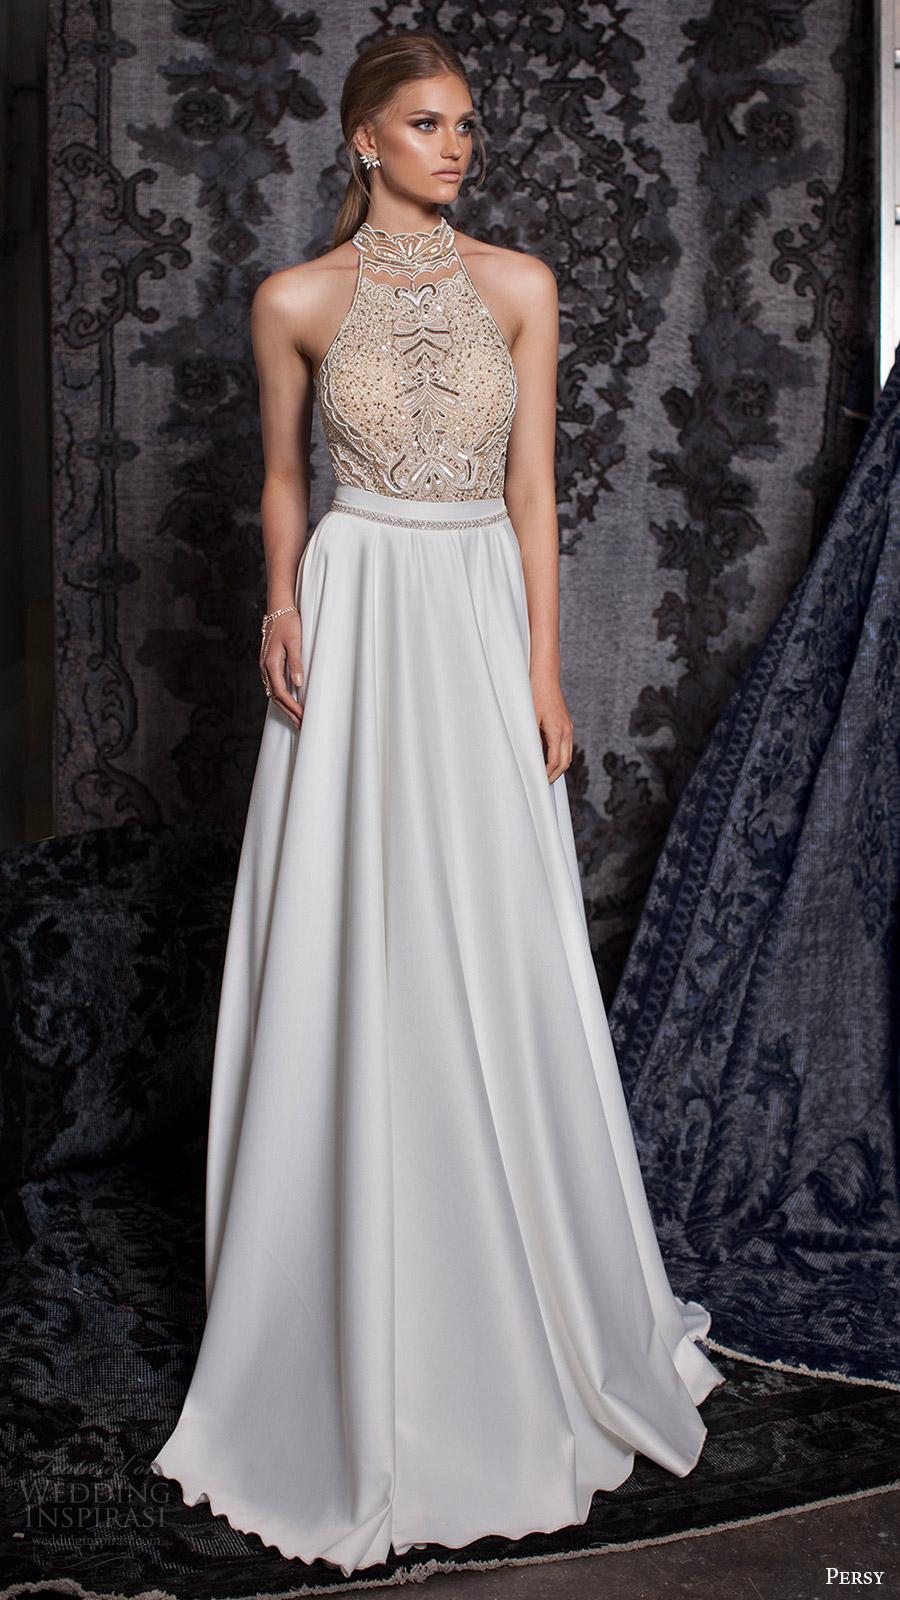 Gypsy Style Wedding Dresses 85 Spectacular persy bridal fall sleeveless